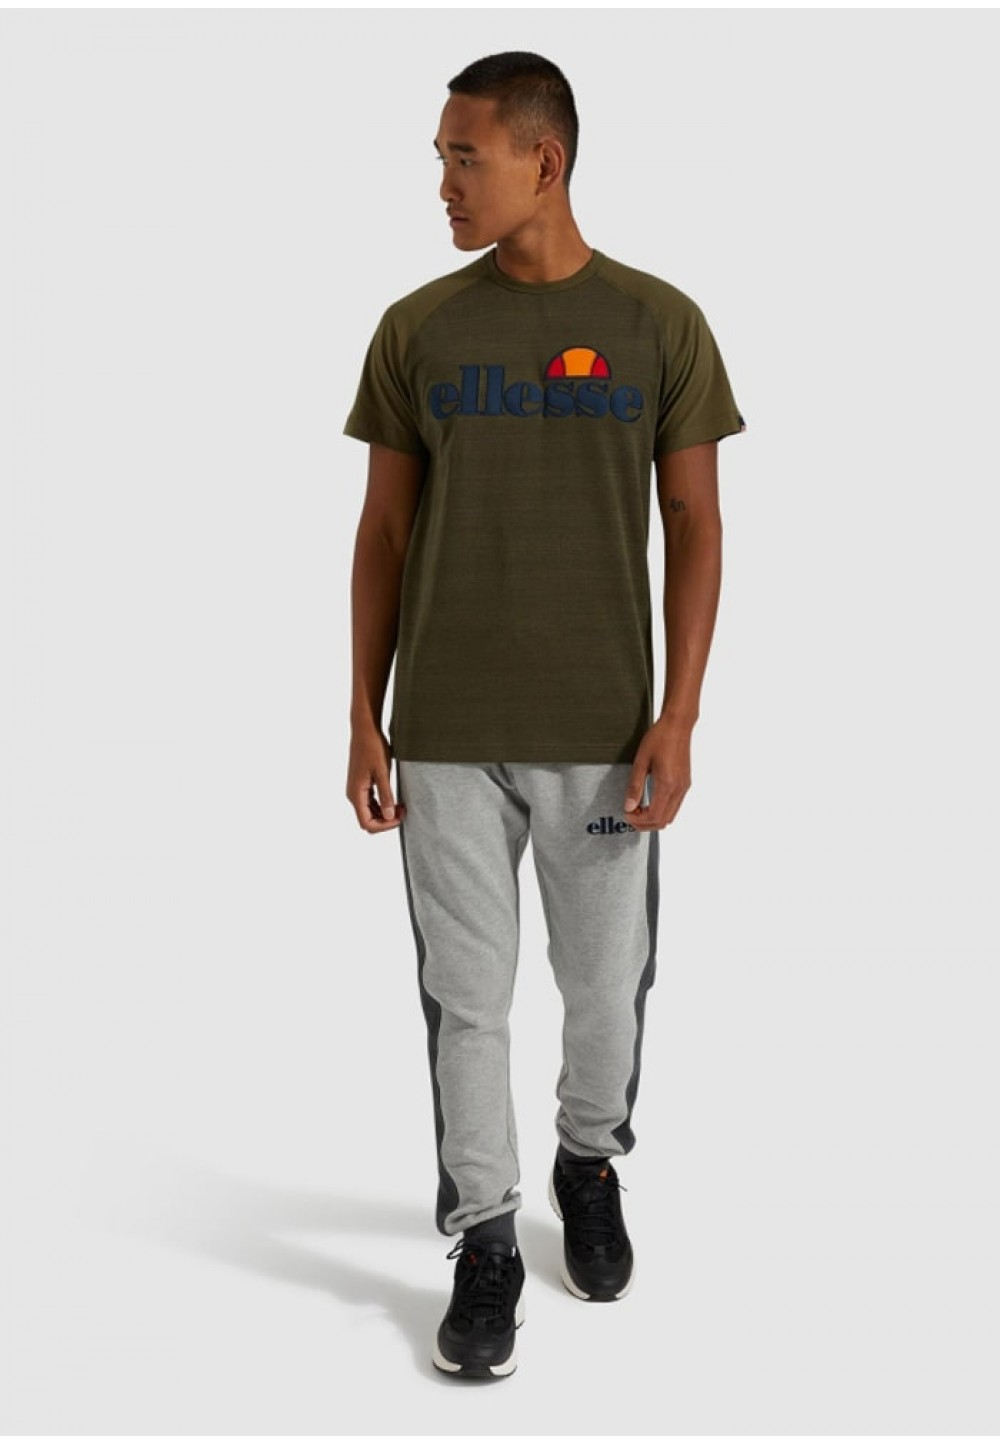 Стильная мужская футболка цвета хаки